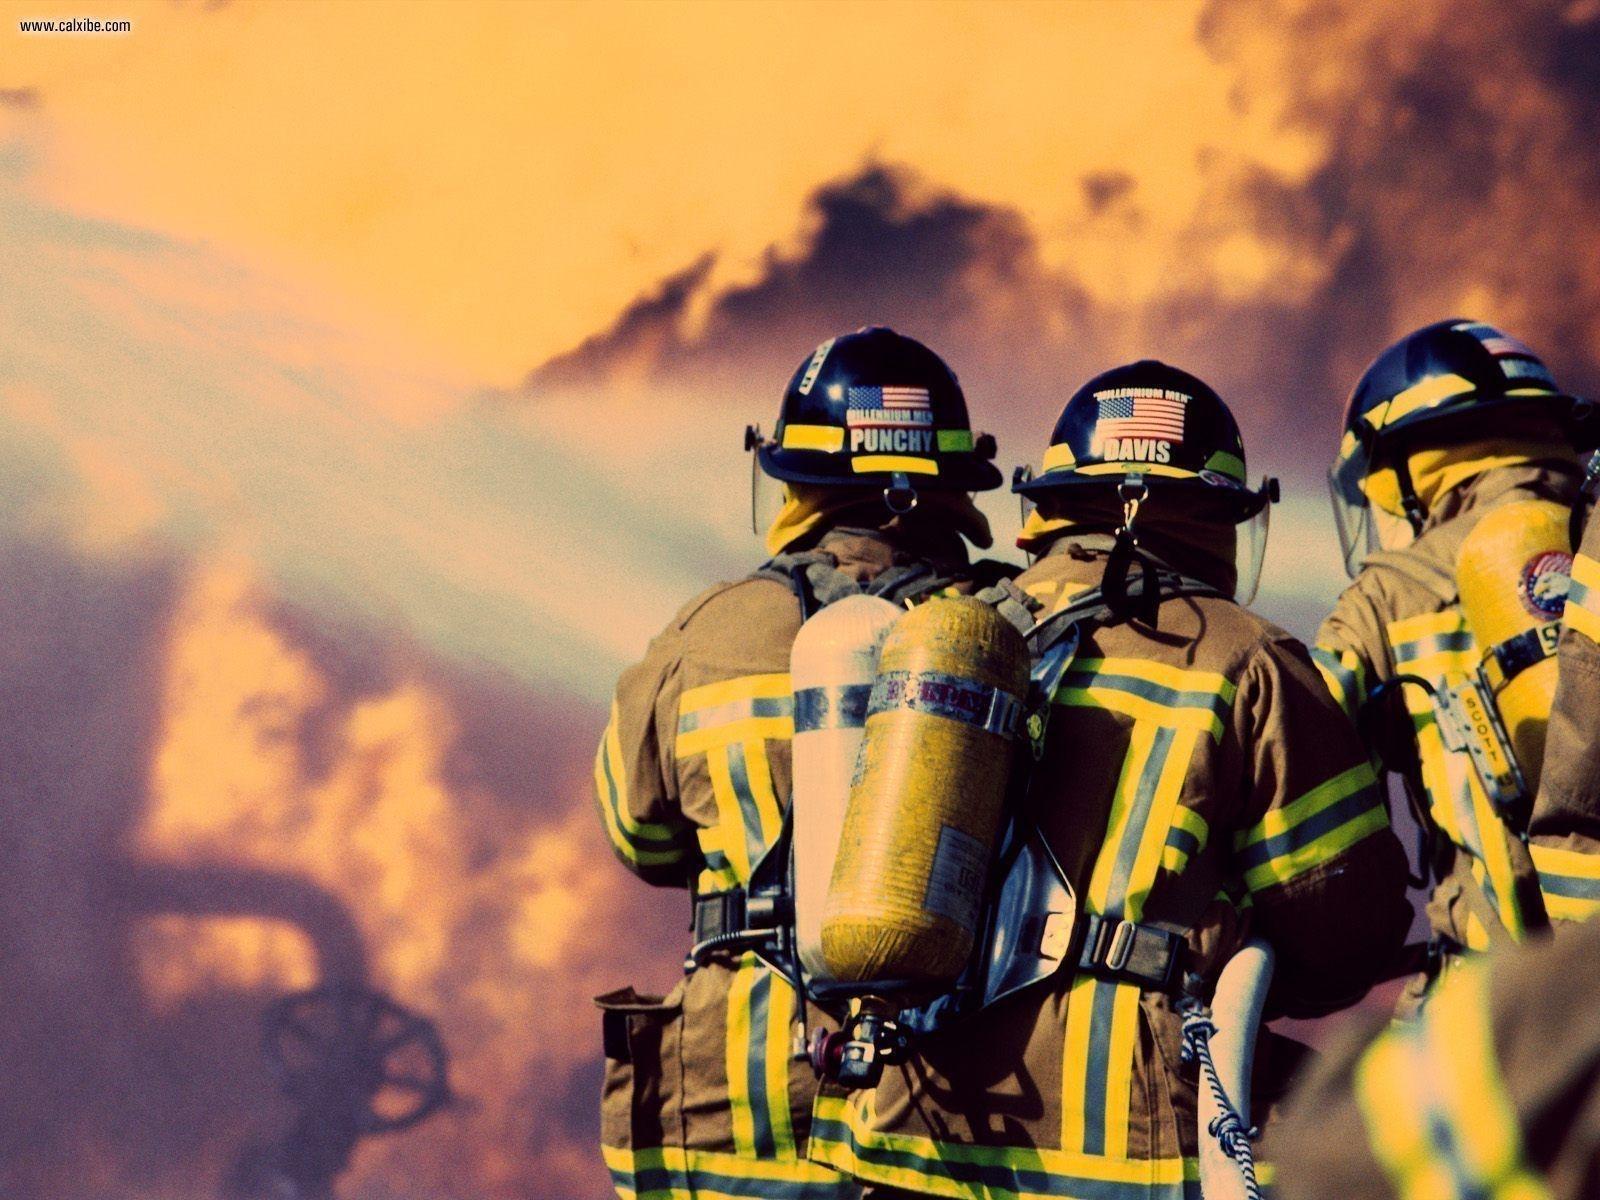 firefighter desktop backgrounds - wallpaper cave